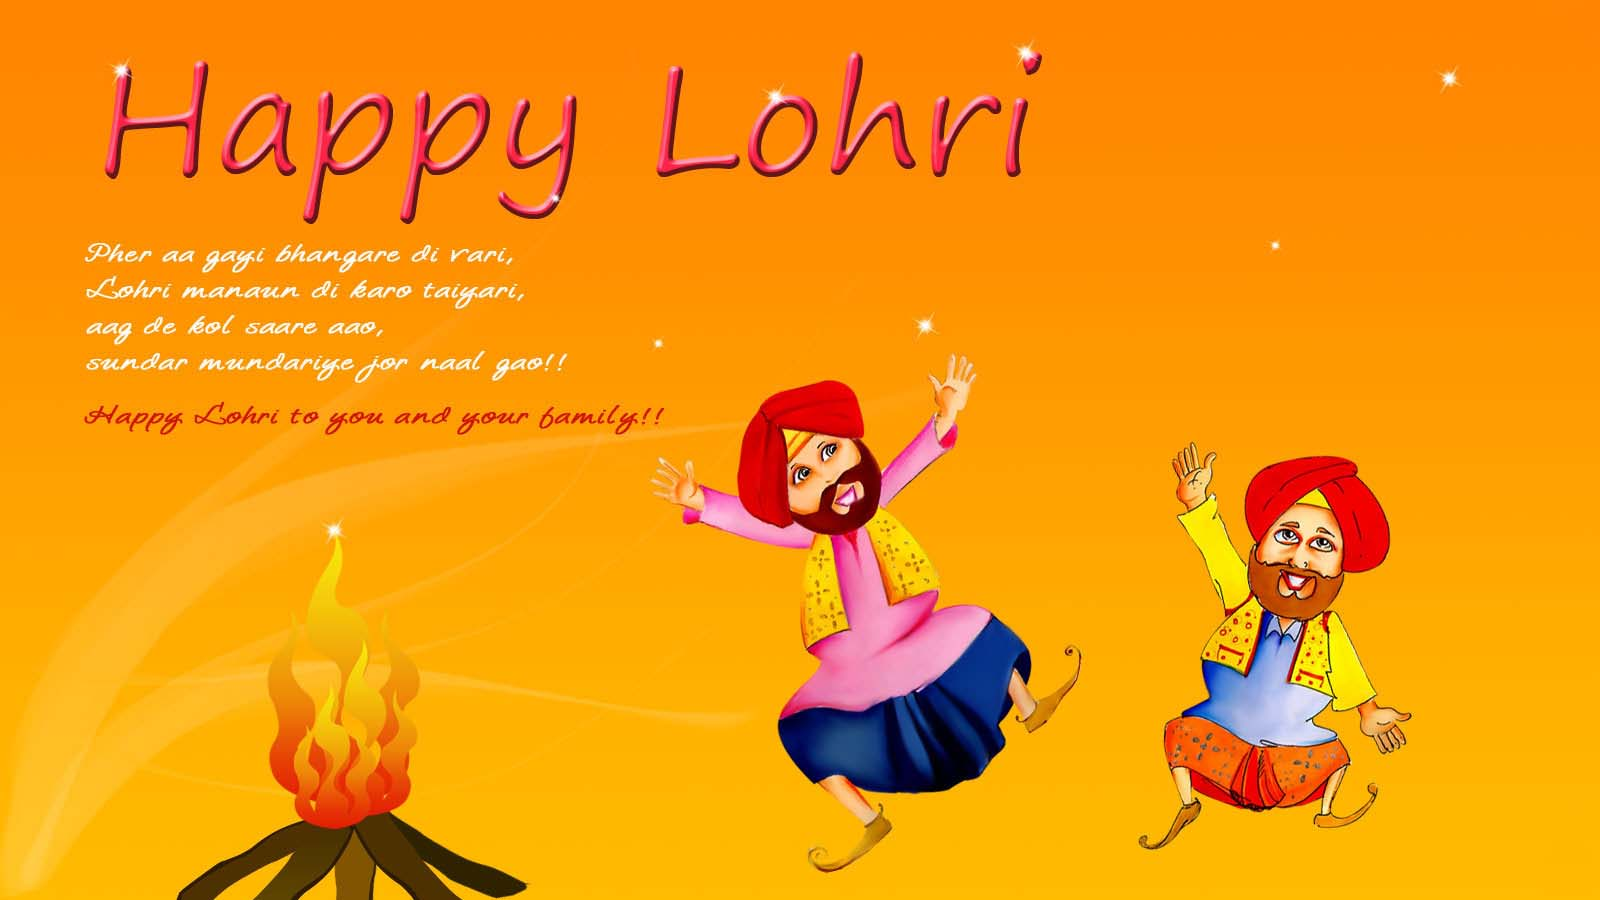 Best Lohri Images for Whatsapp DP Profile Wallpaper - Free Download